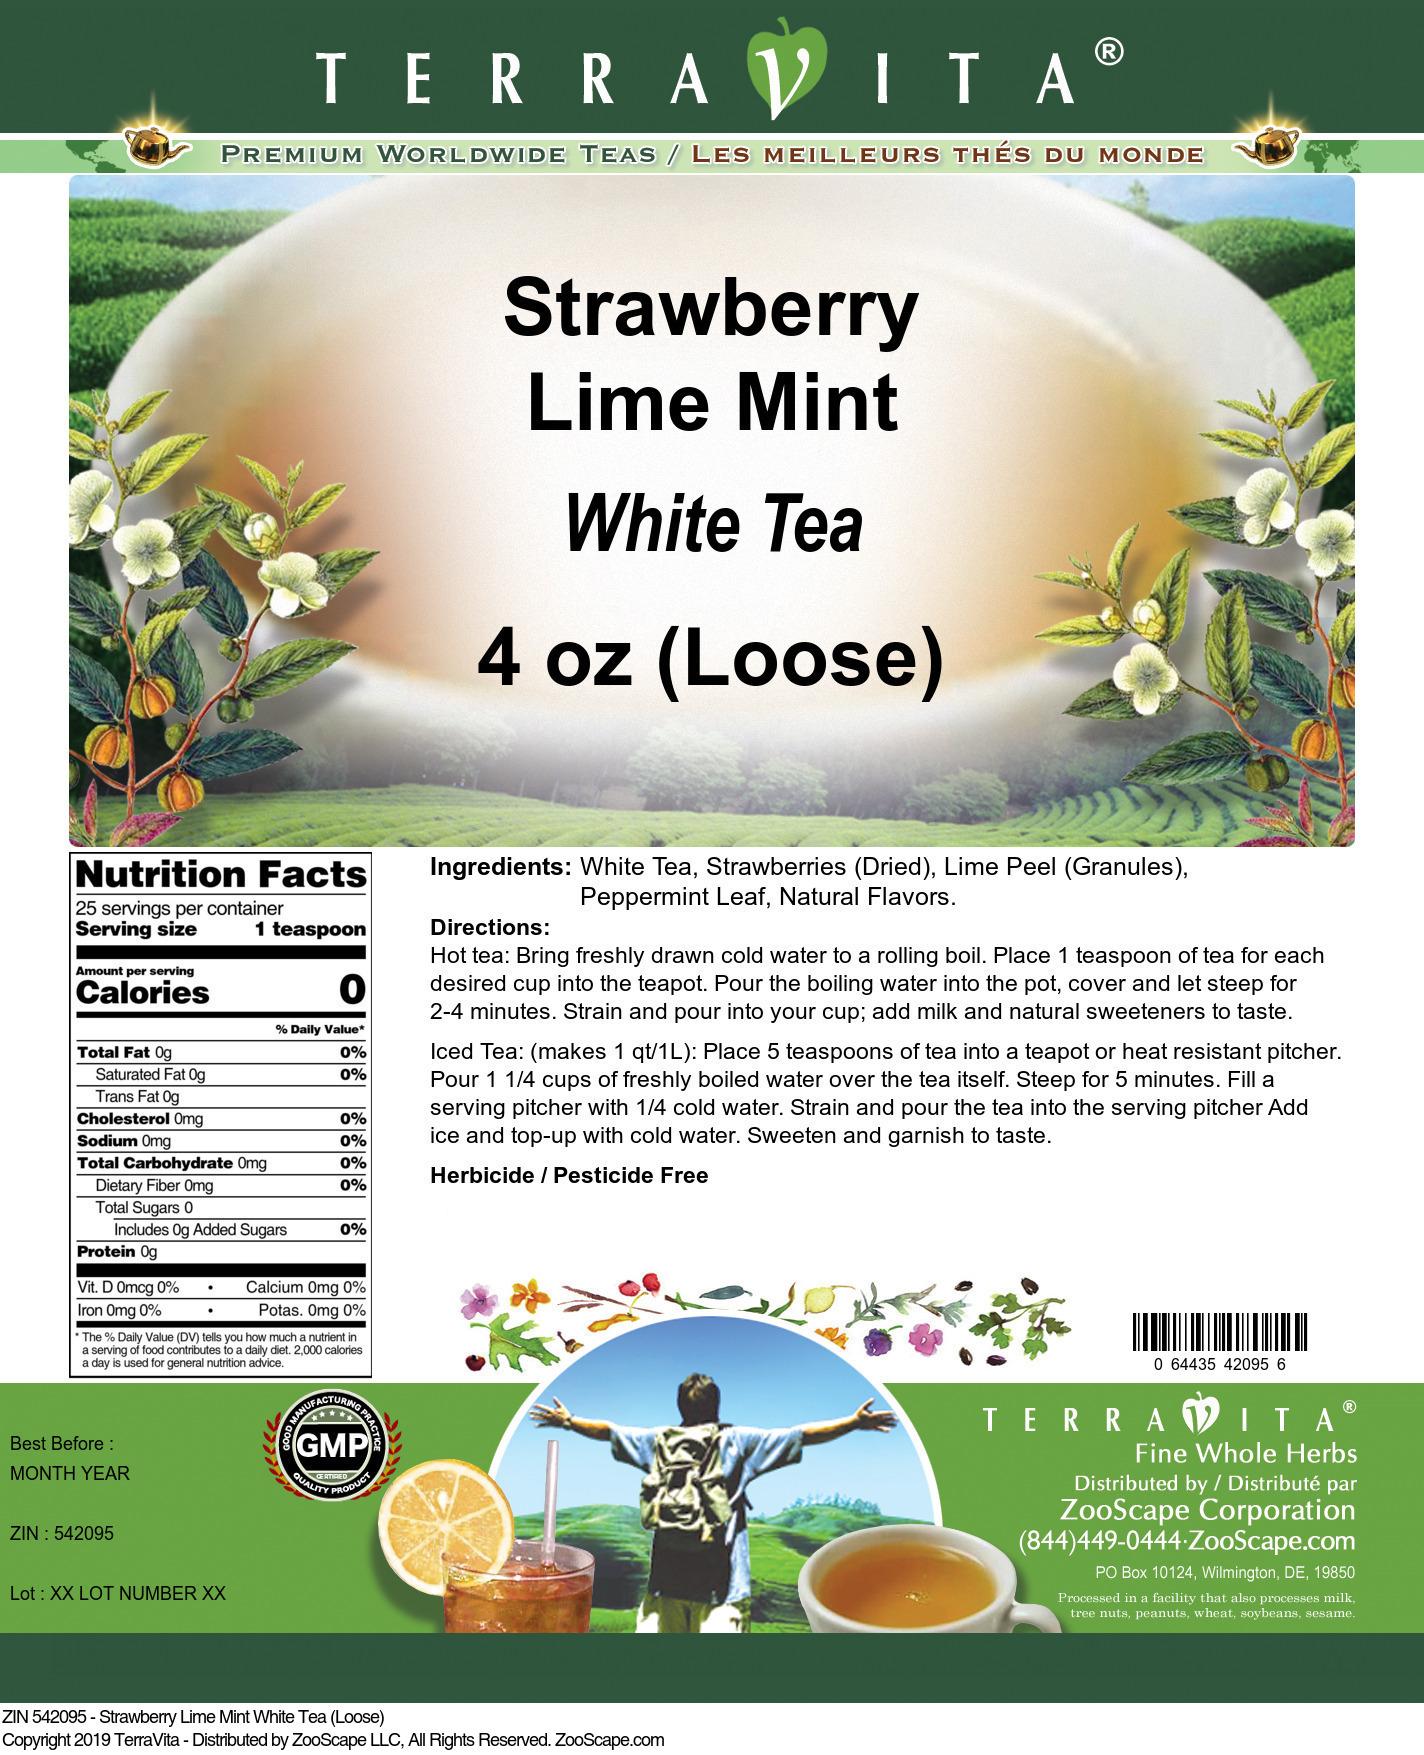 Strawberry Lime Mint White Tea